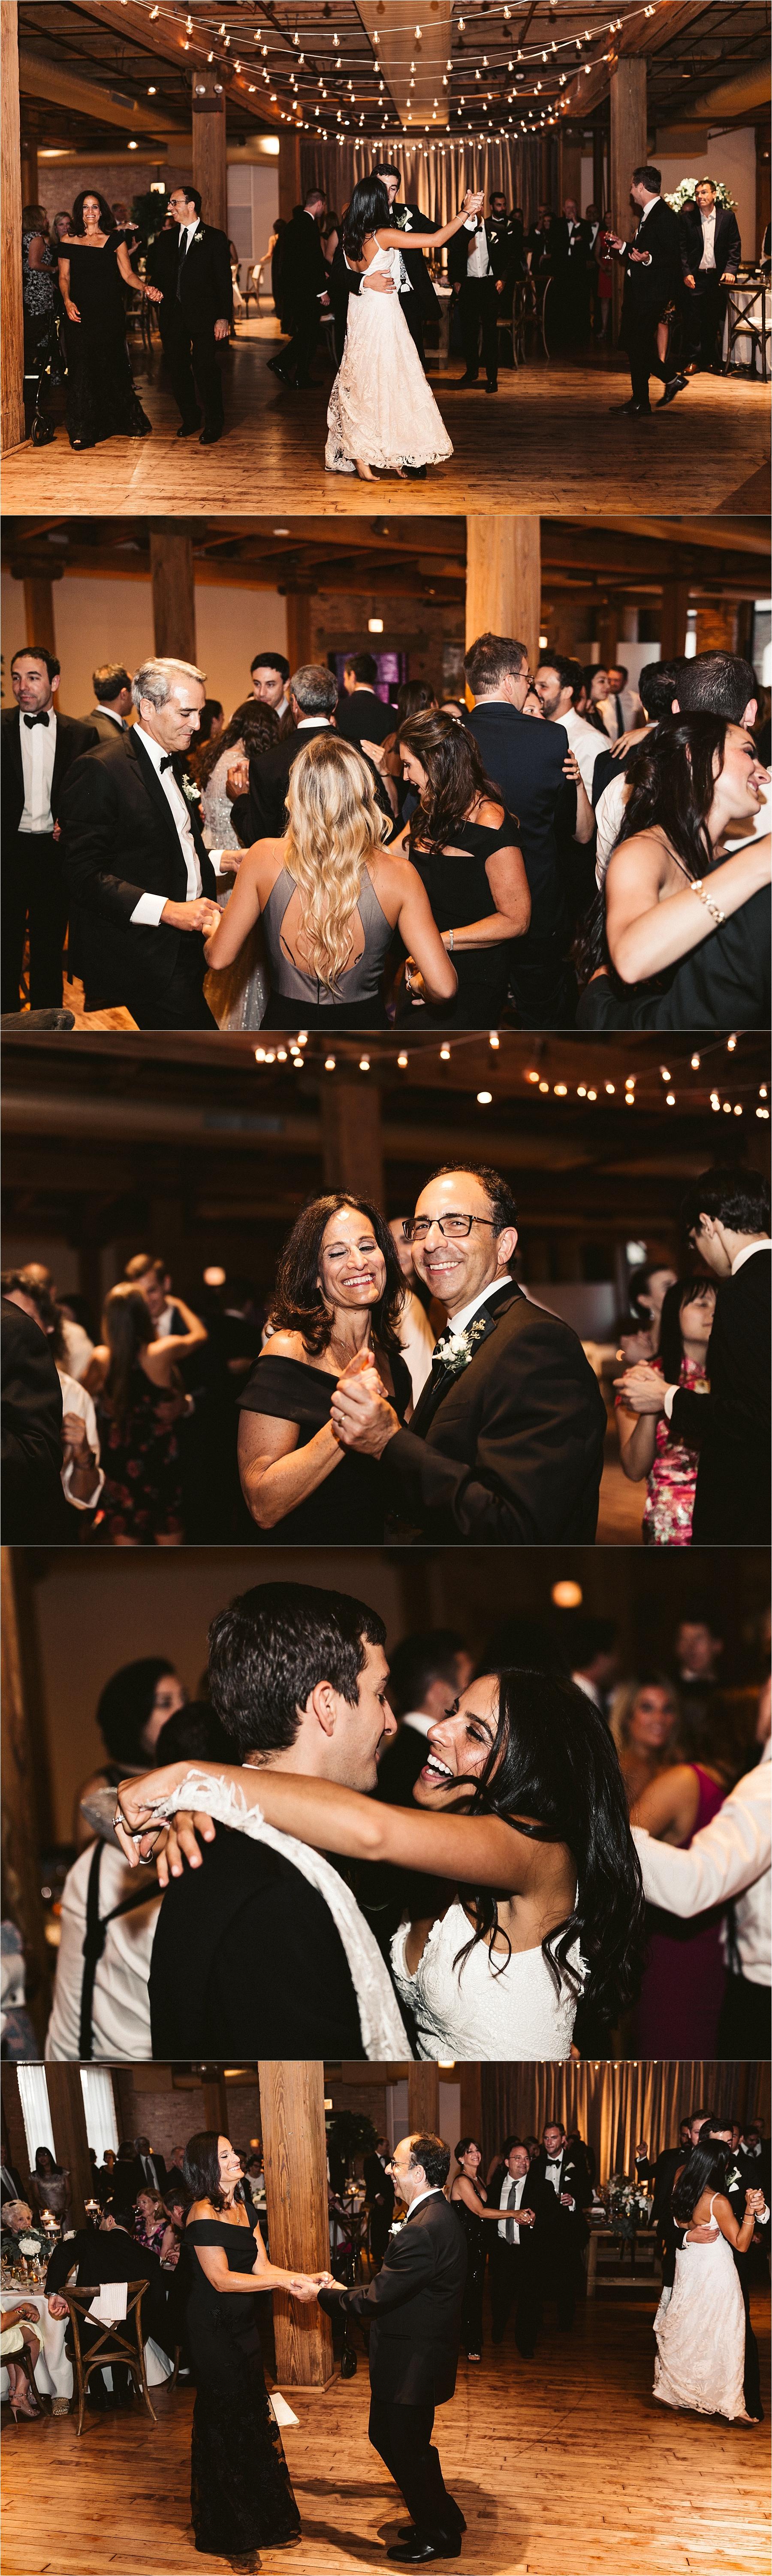 Bridgeport Art Center Wedding_0122.jpg